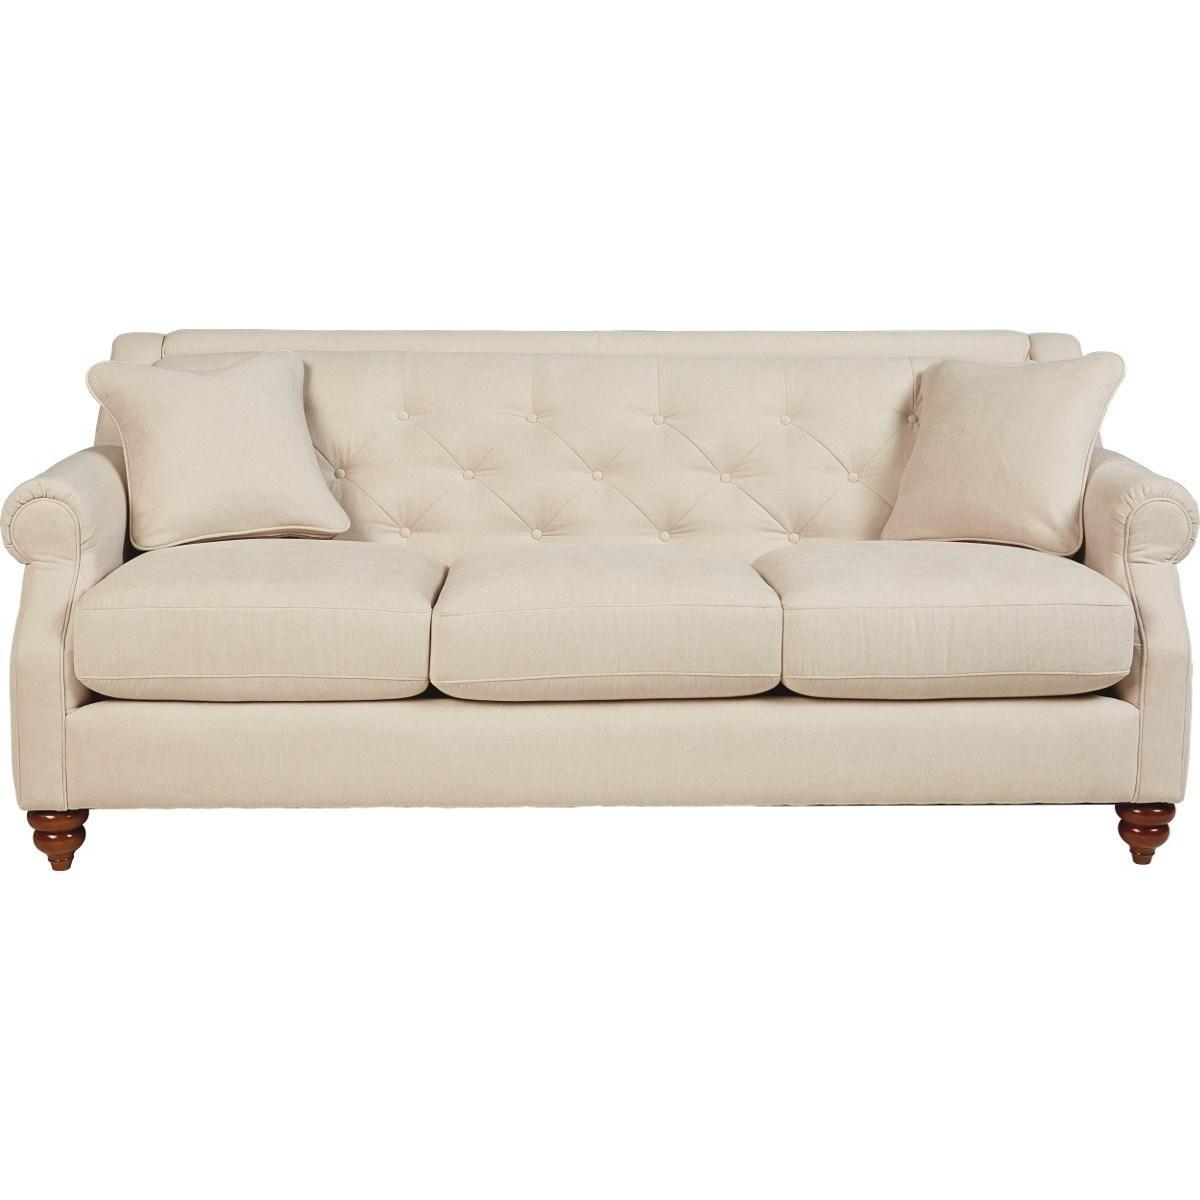 Aberdeen Sofa by La-Z-Boy at Home Furnishings Direct